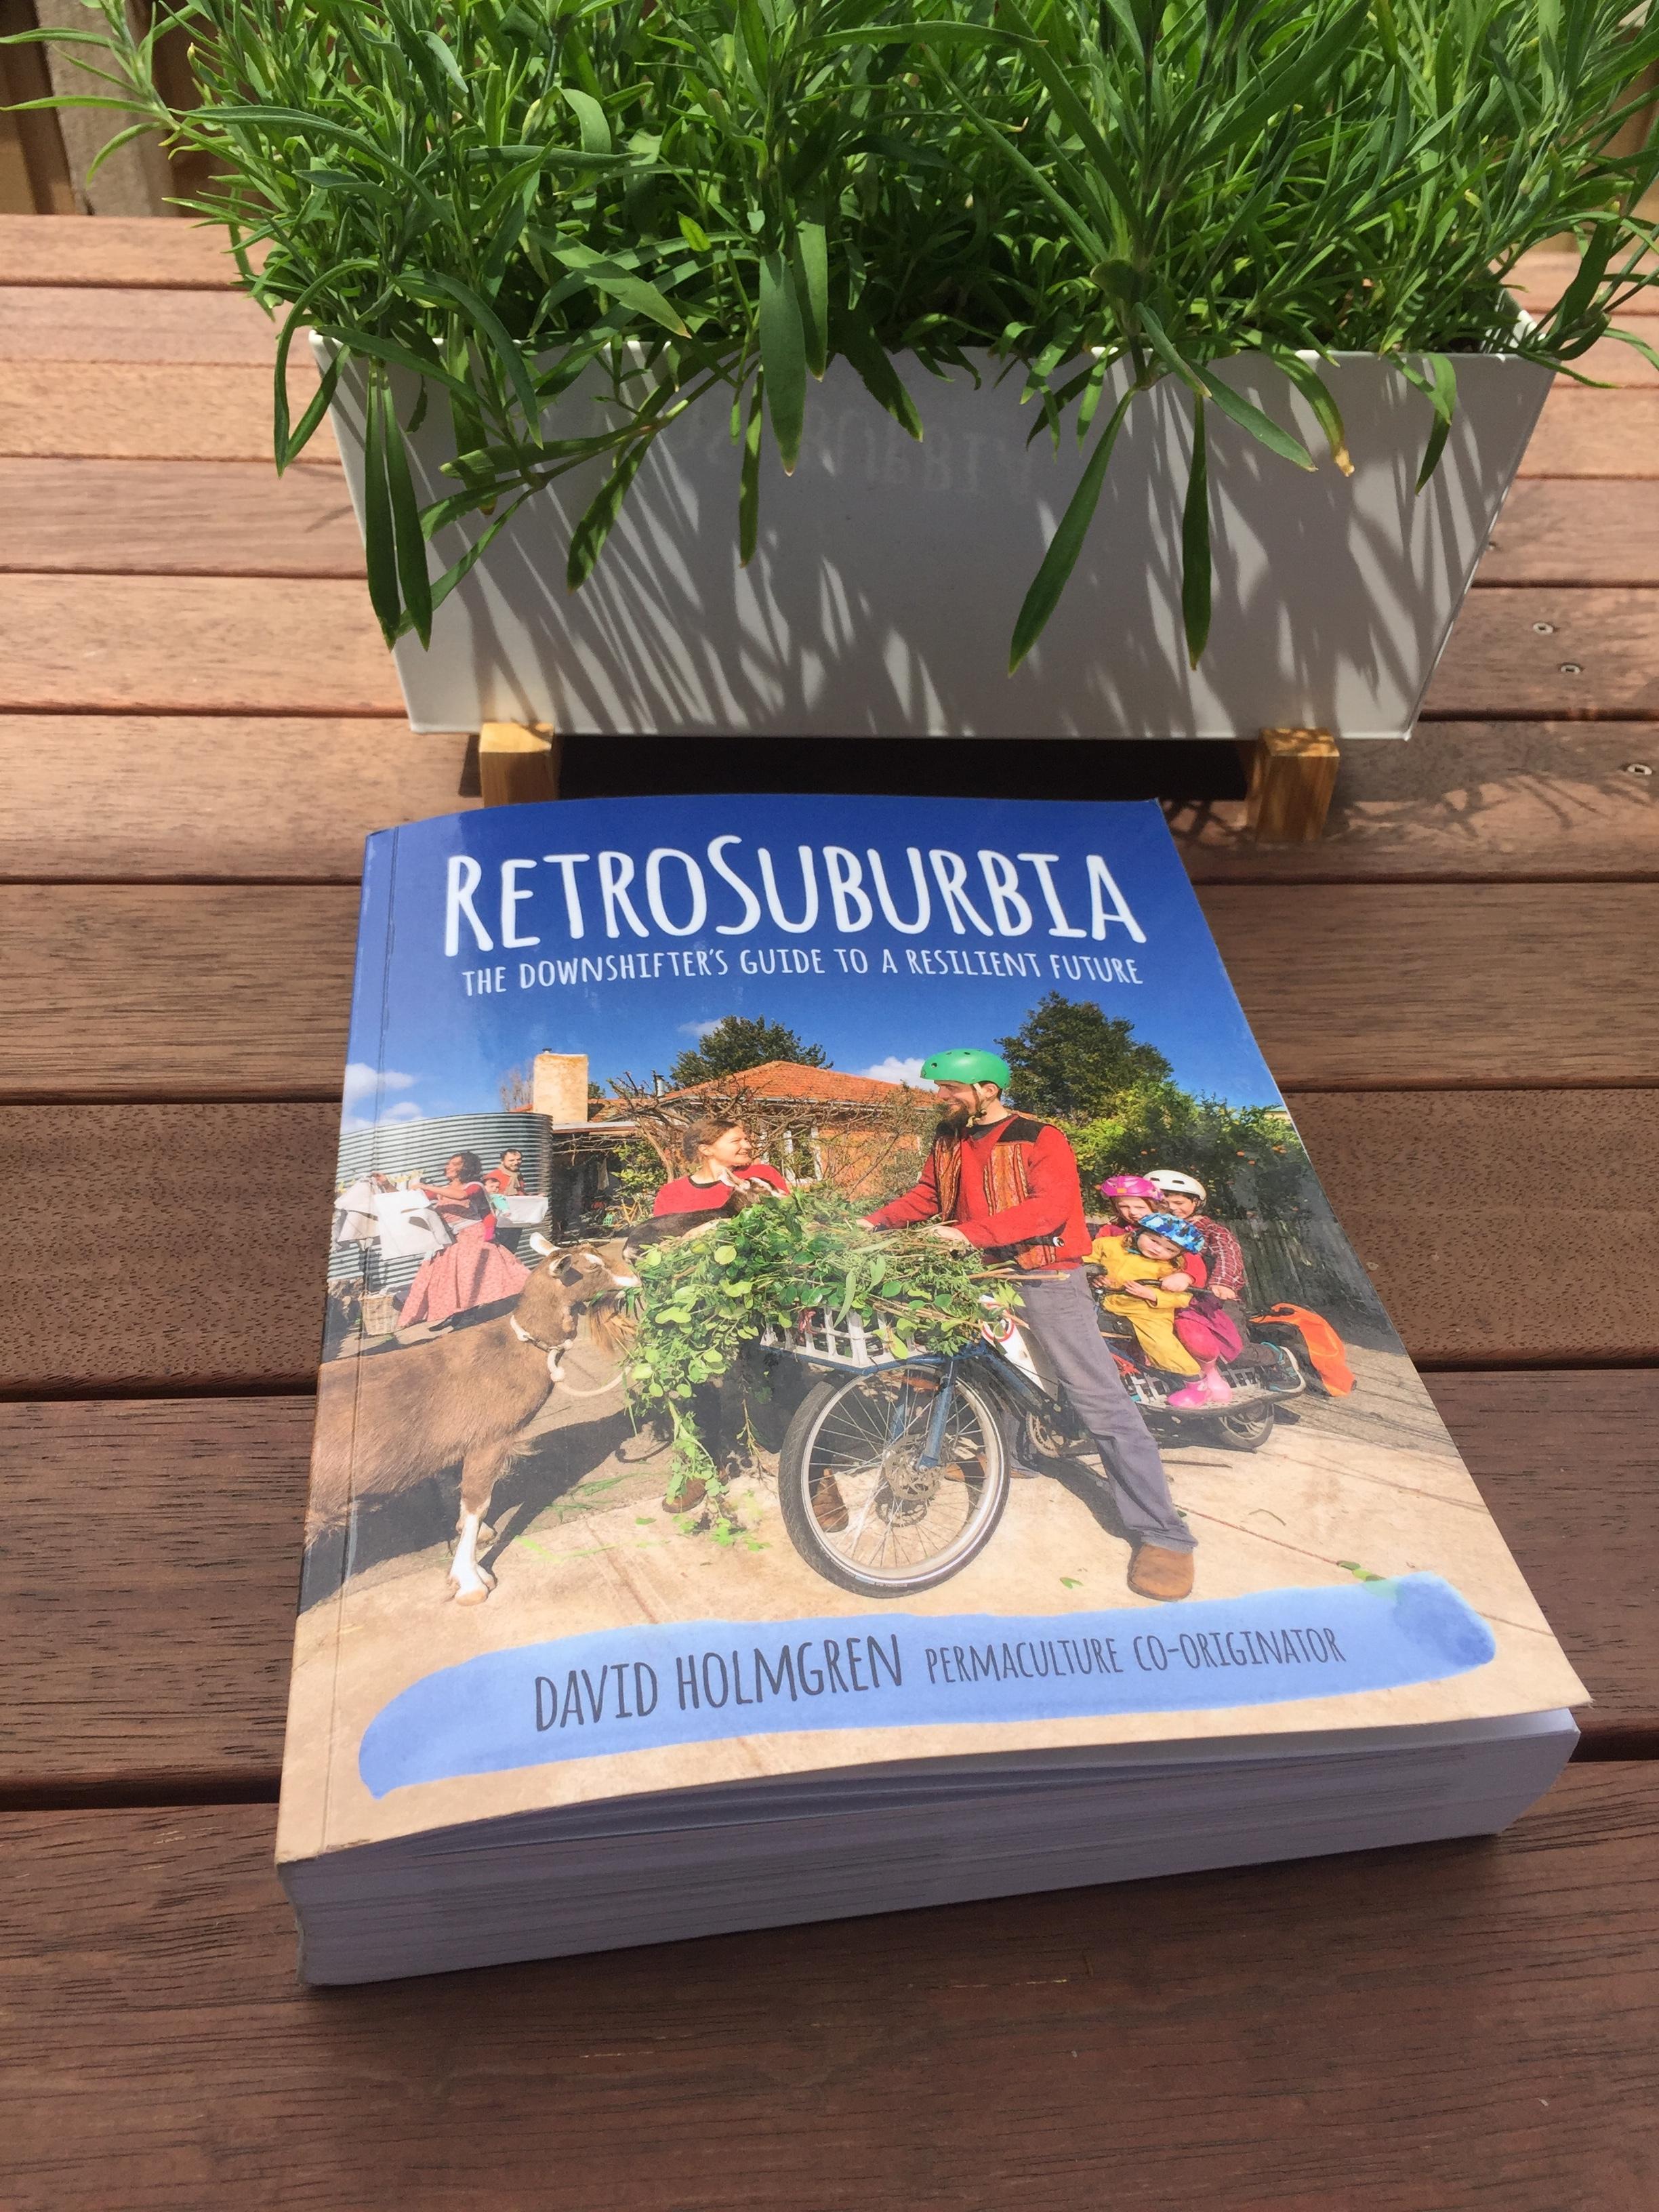 Retrosuburbia  by David Holmgren